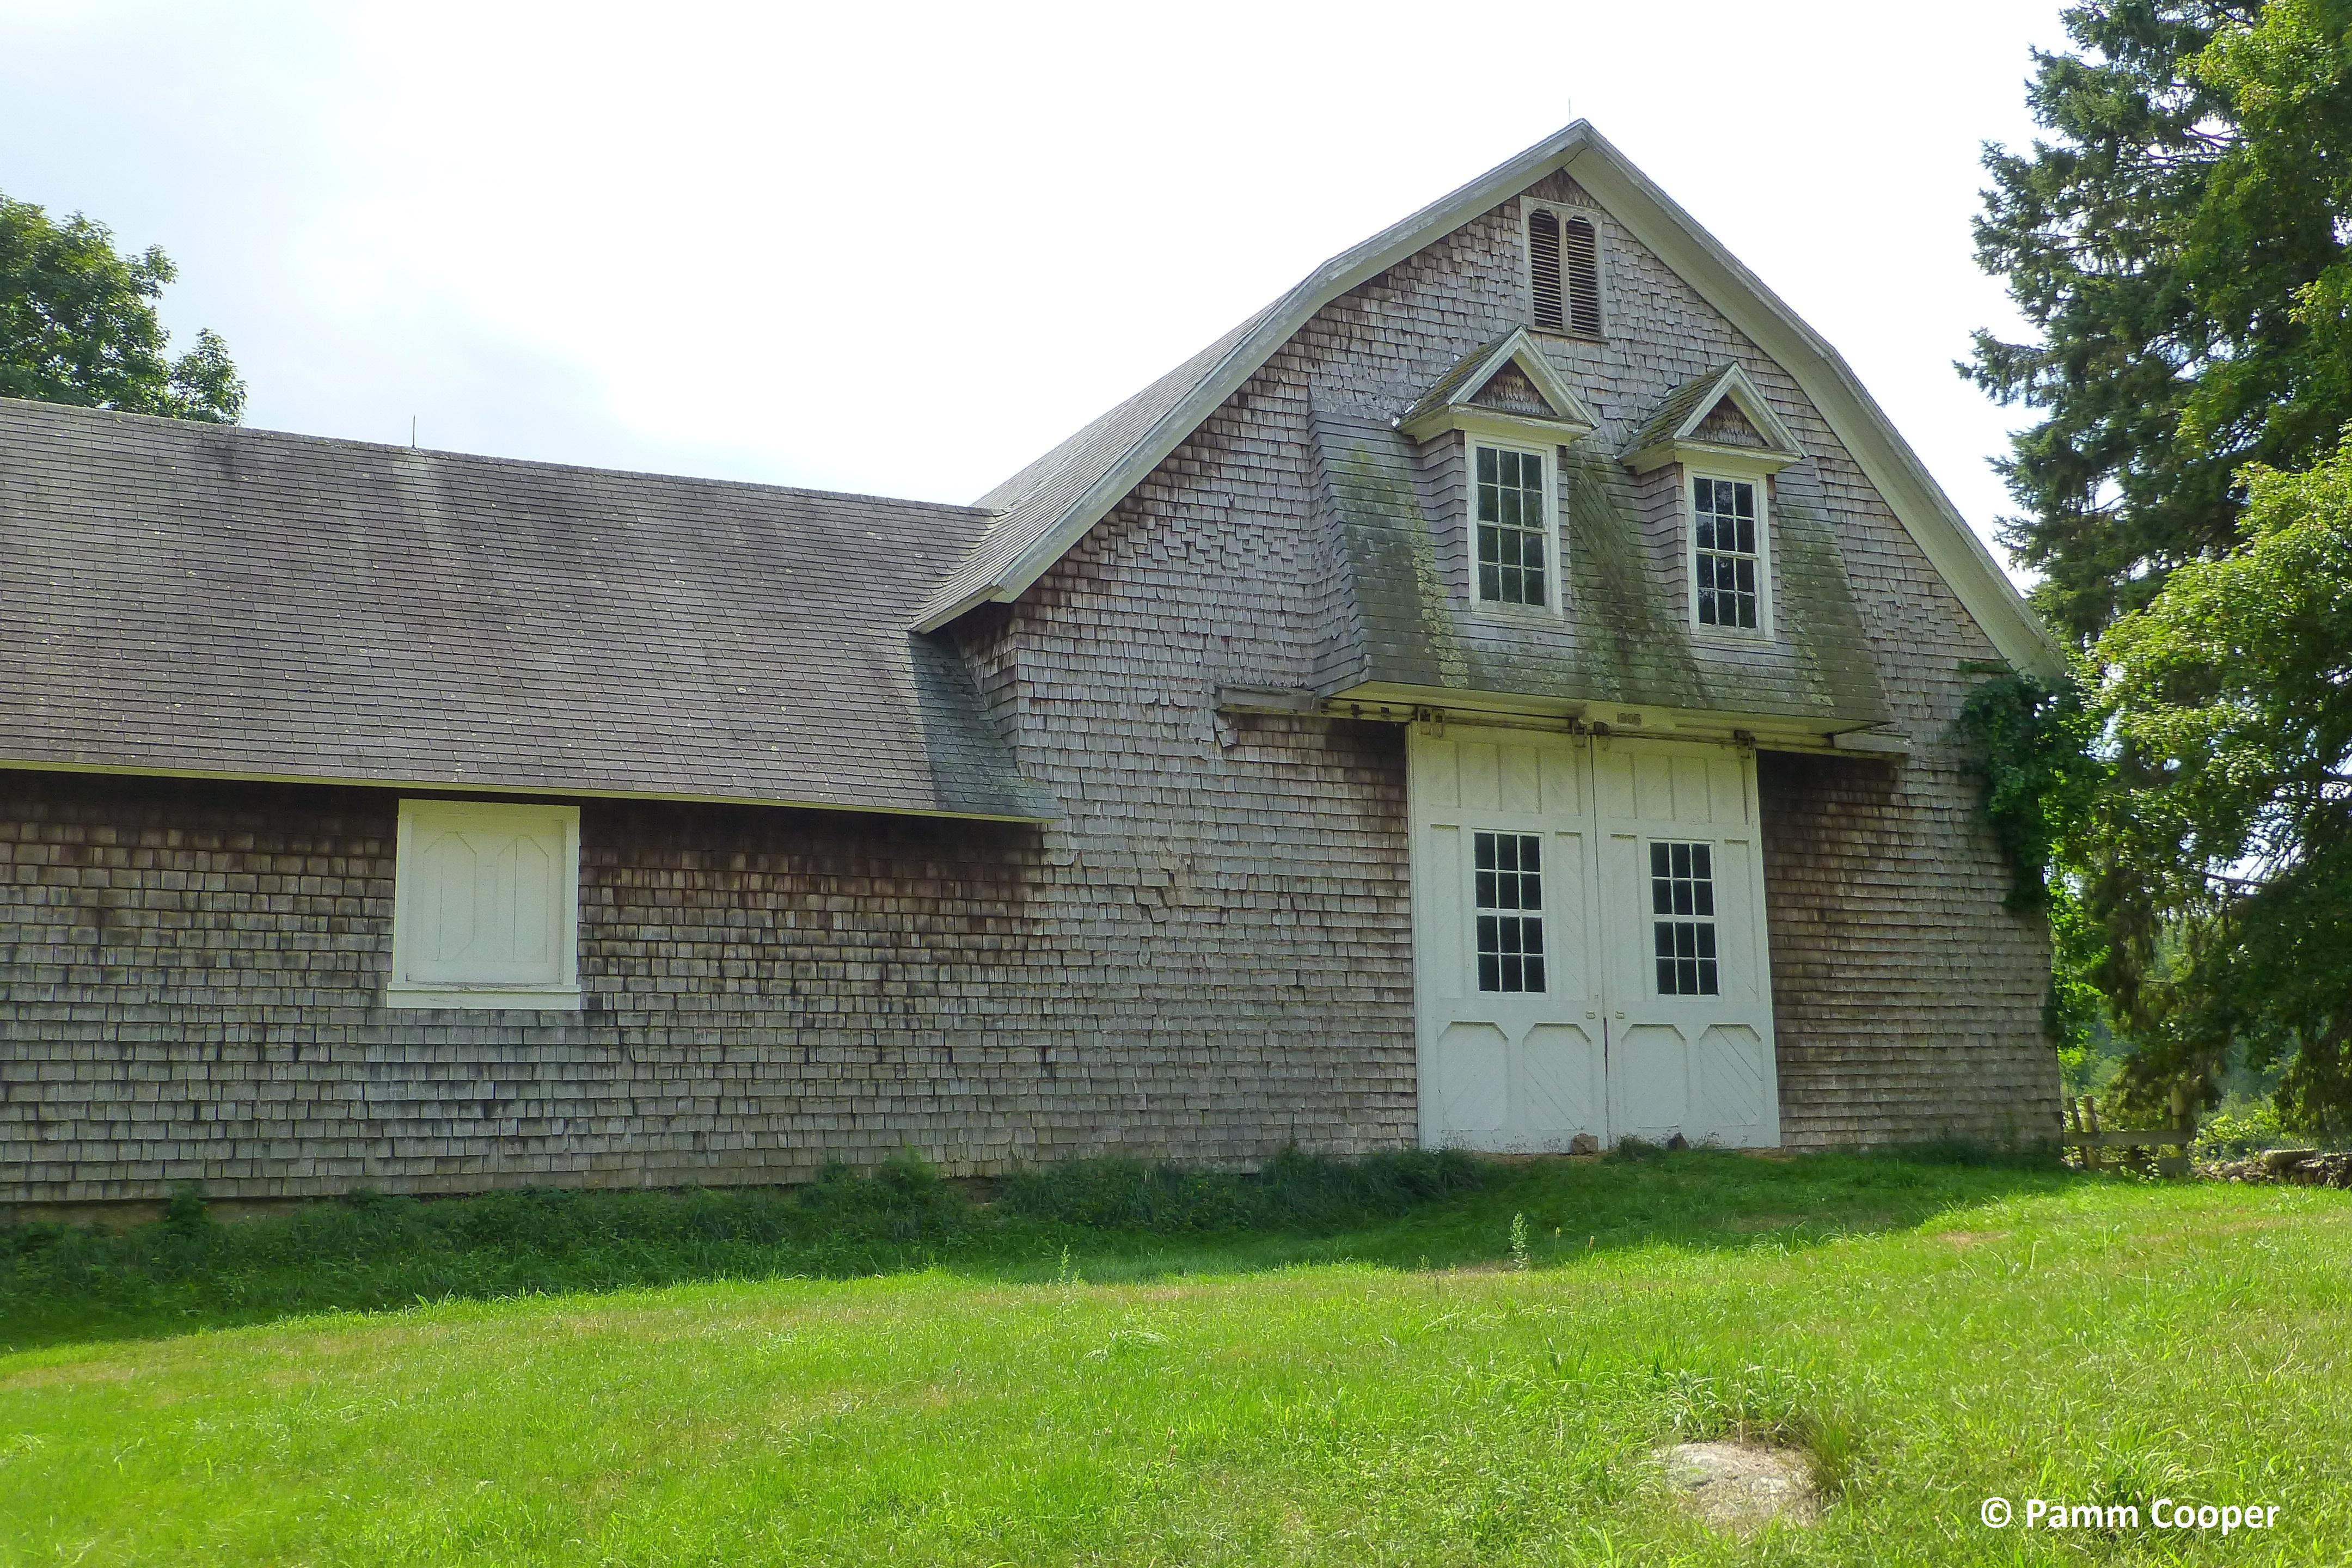 Morse Farm barn scotland, Ct with gambrel roof and sliding doors